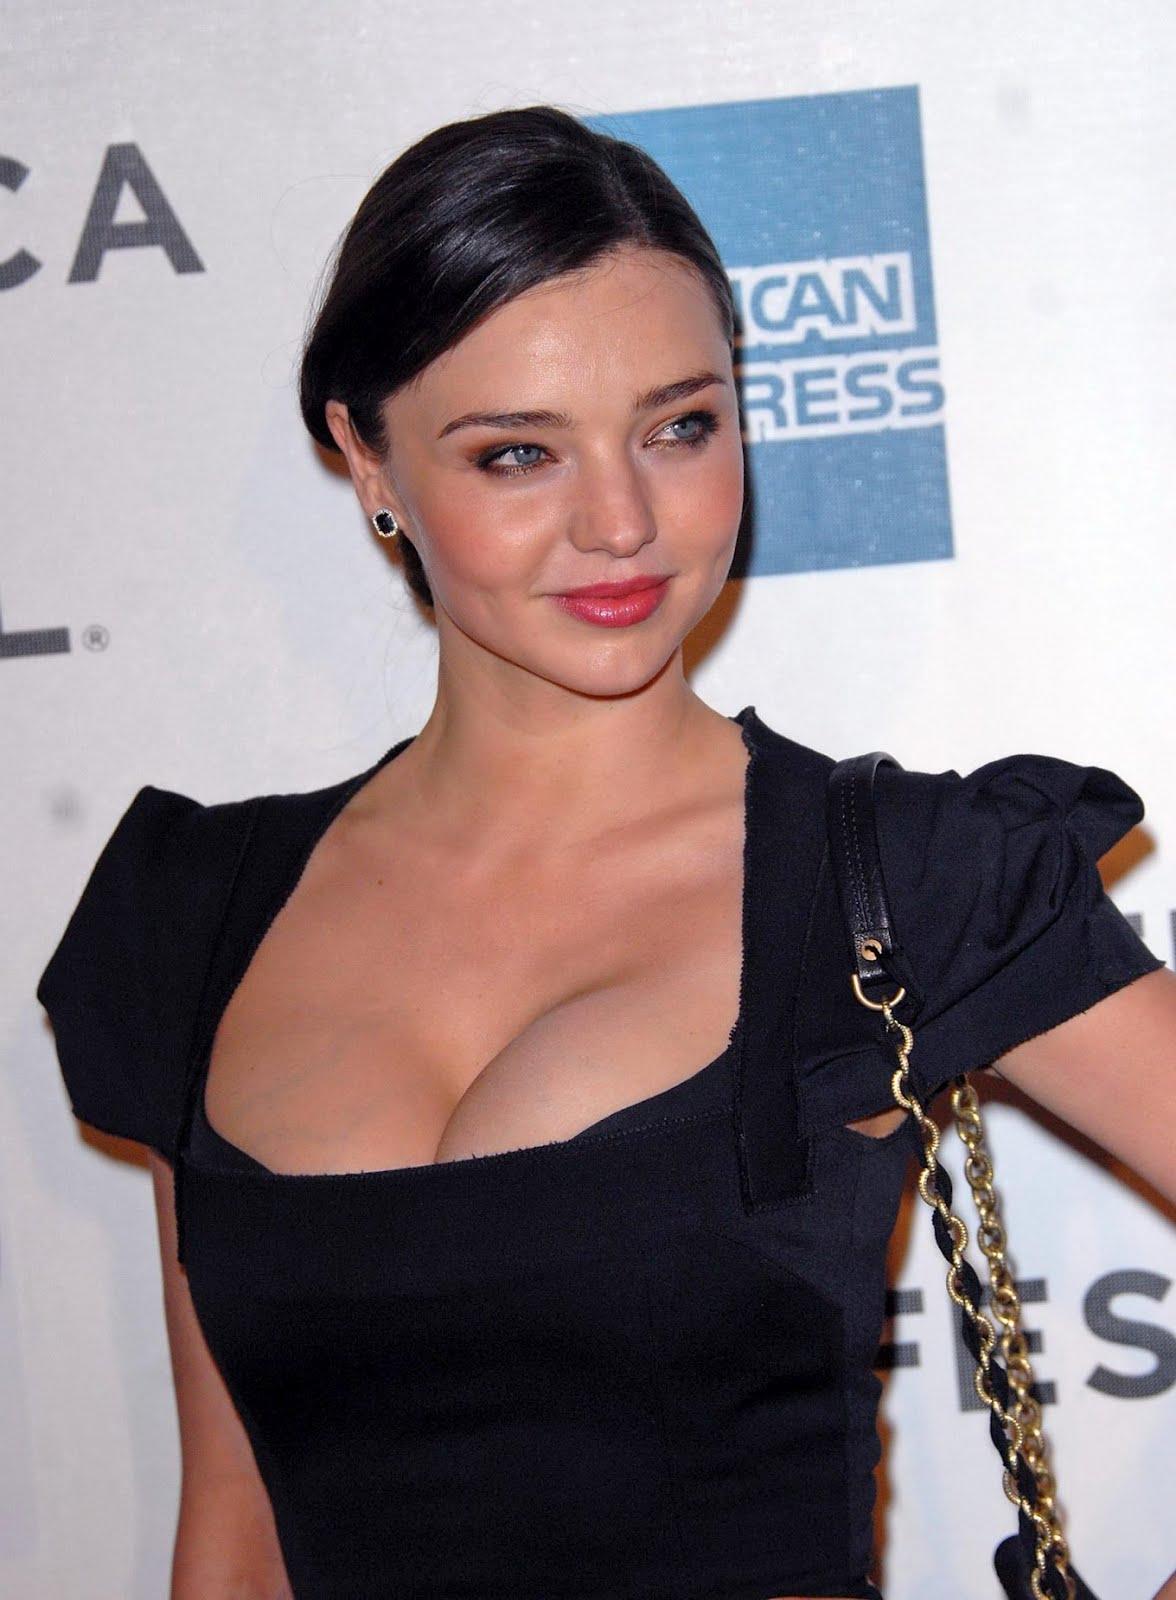 Miranda Kerr Sizzzzle In Black - Watch Latest Movies ...